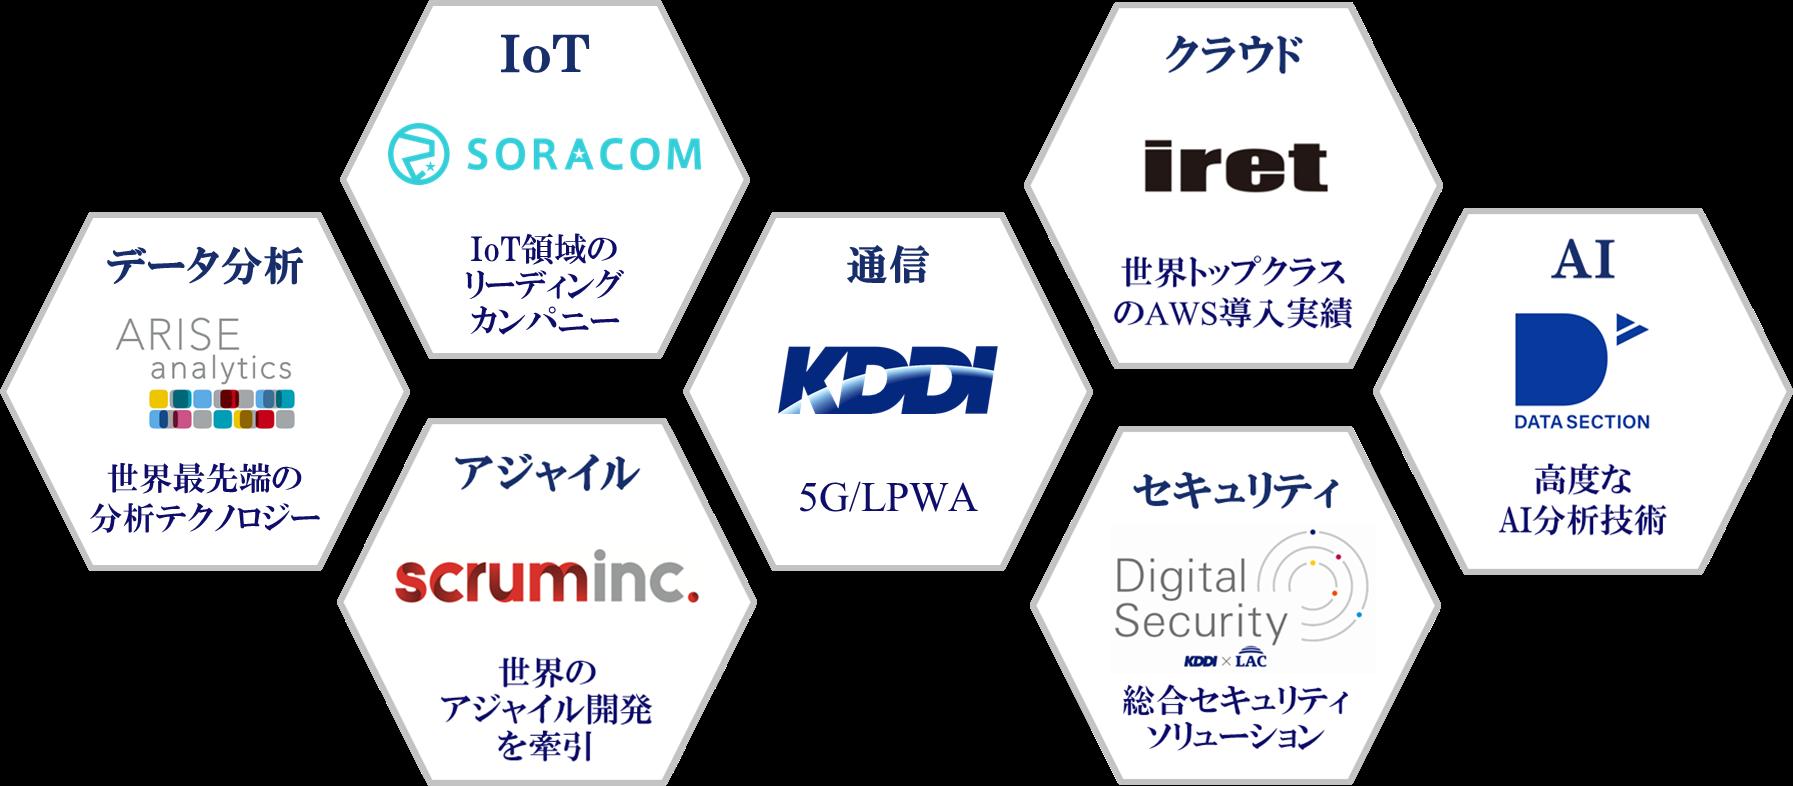 AI解析技術を強みとしたパートナーとして「KDDI DIGITAL GATE」に参画